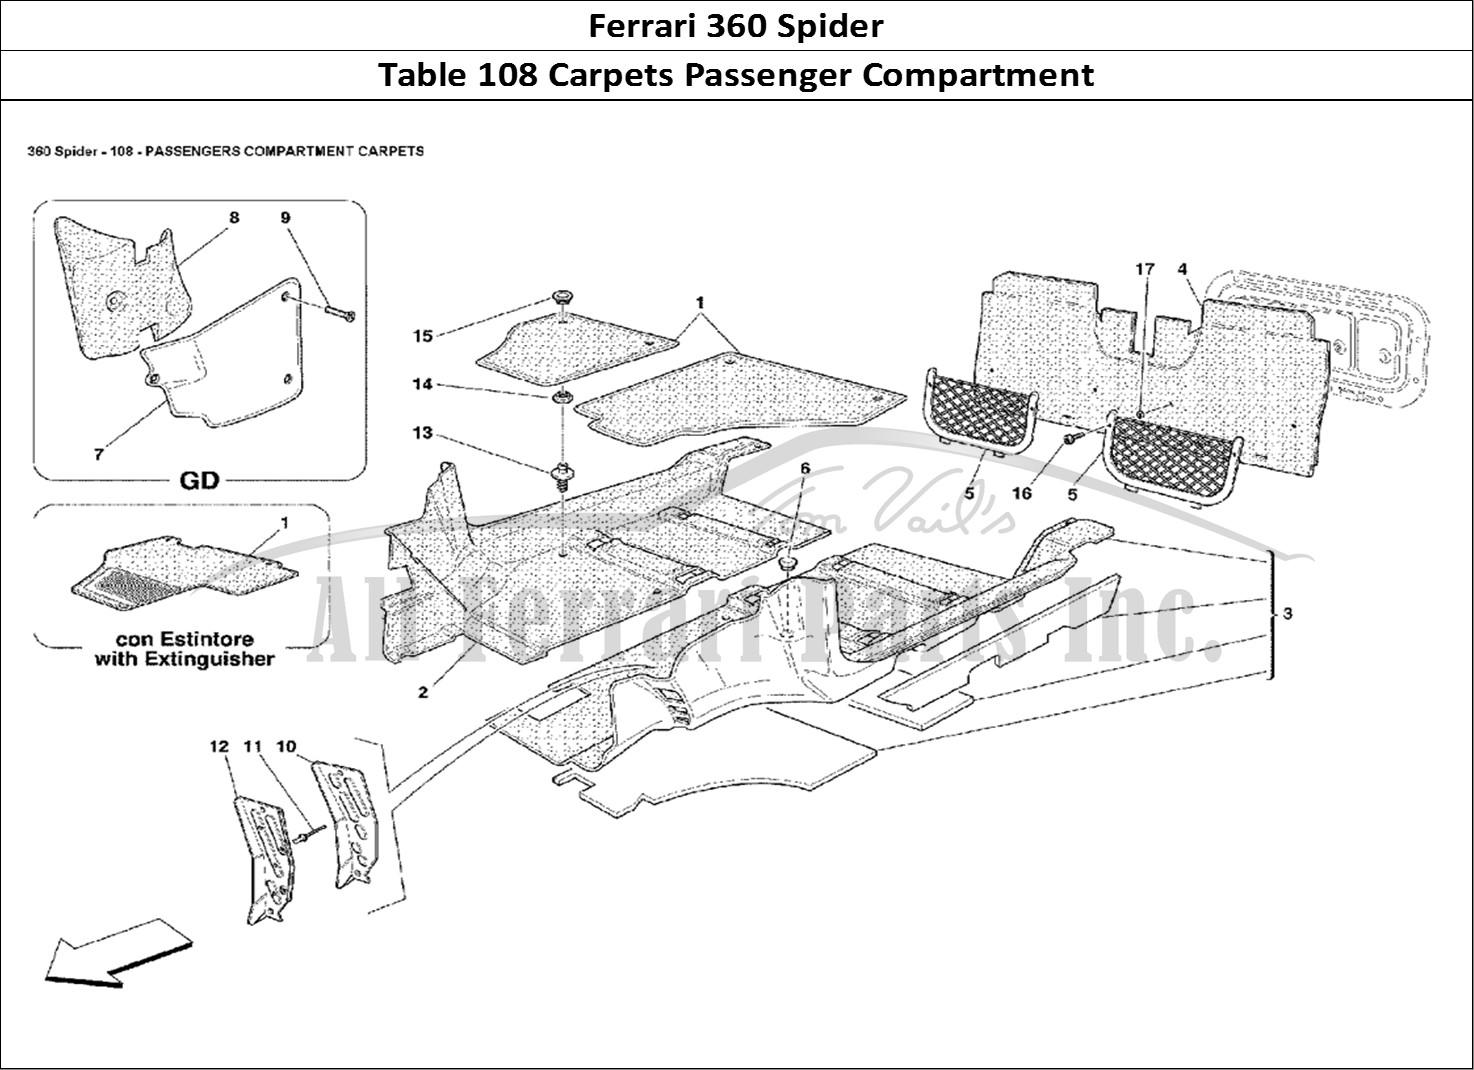 hight resolution of  2000 chrysler sebring serpentine belt diagram html in addition bmw 325i engine cooling system diagram additionally